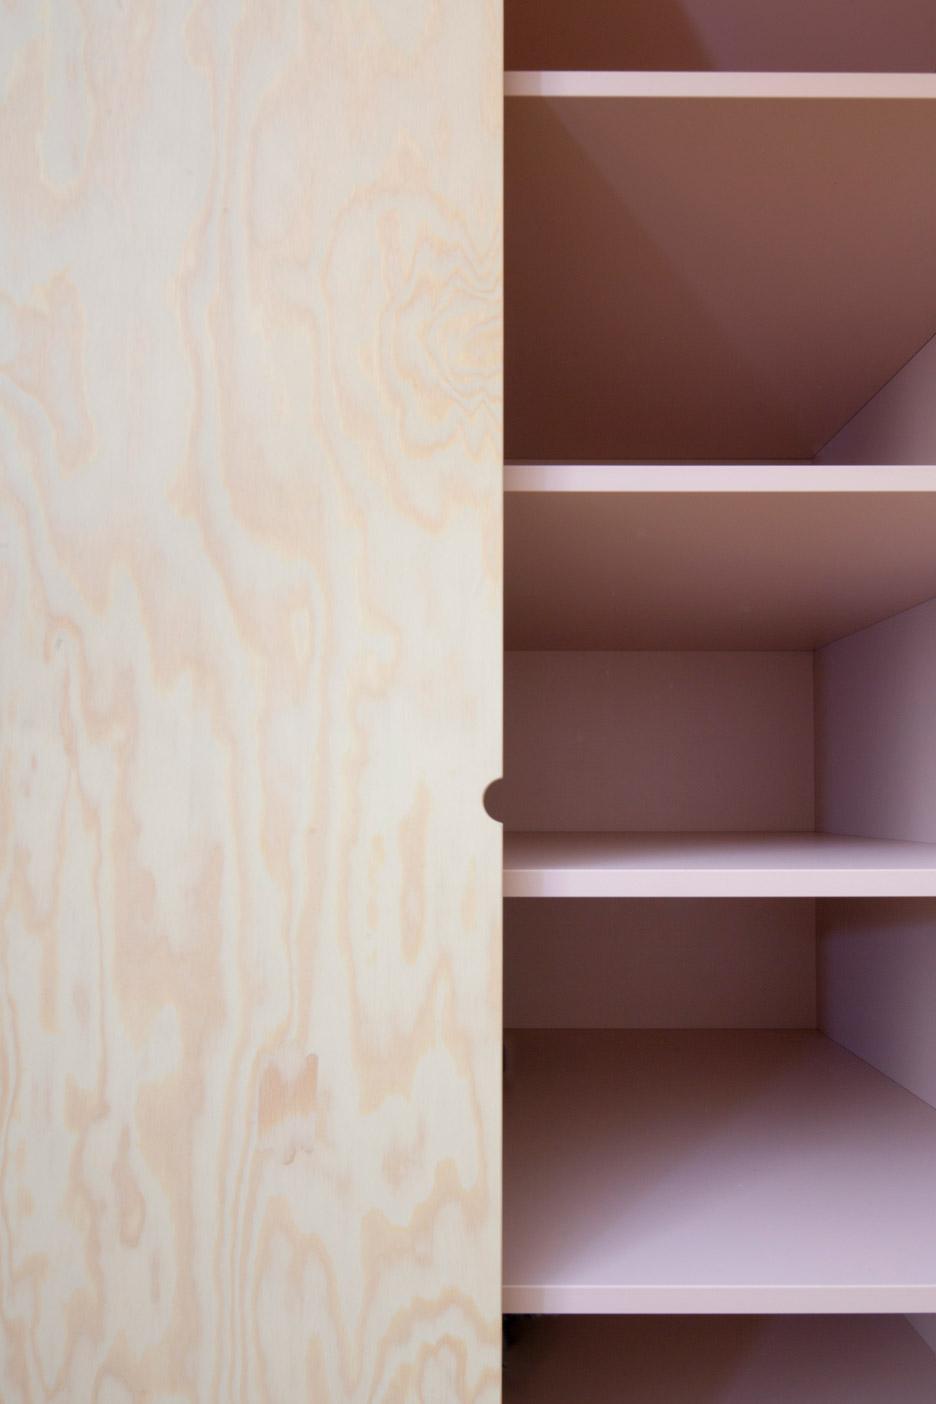 Inhabited wooden walls in geneva by aurelie monet kasisi  dezeen 936 12.jpg